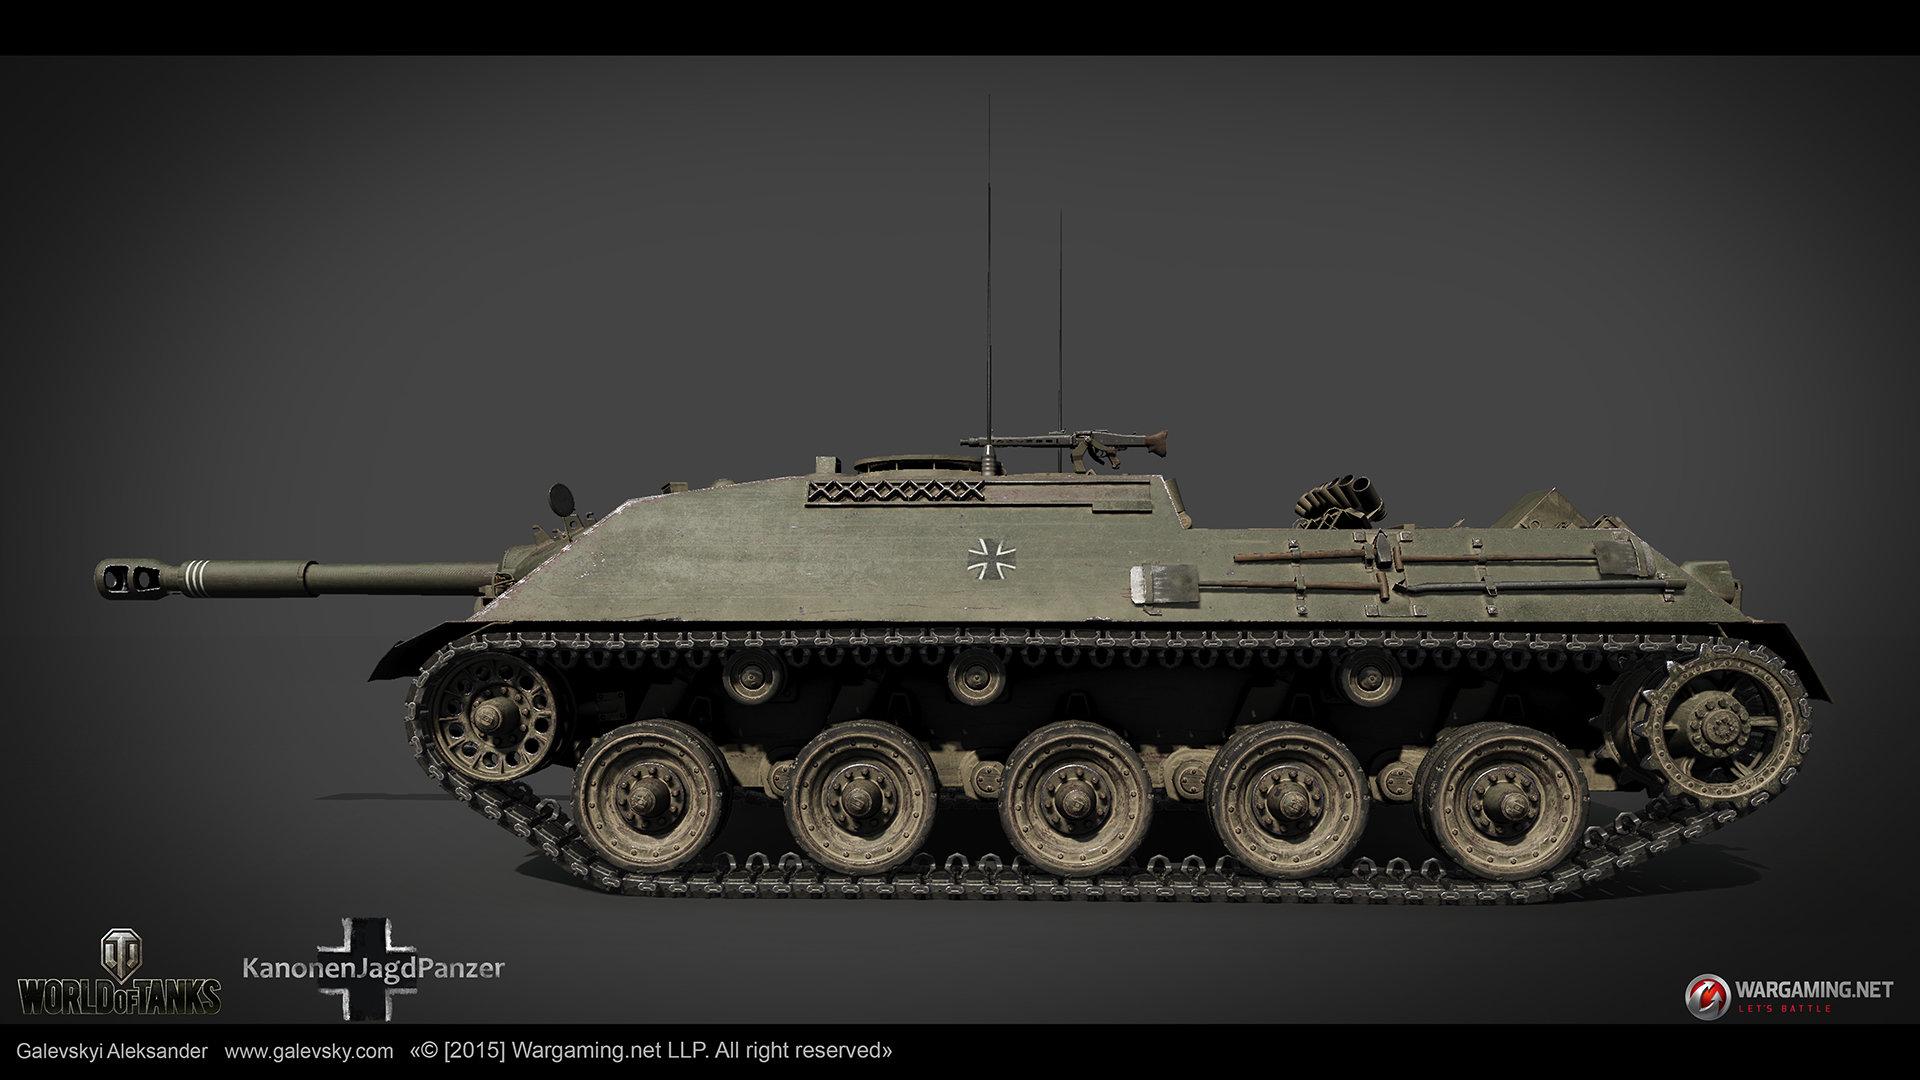 Aleksander galevskyi kanonenjagdpanzer fin small 03